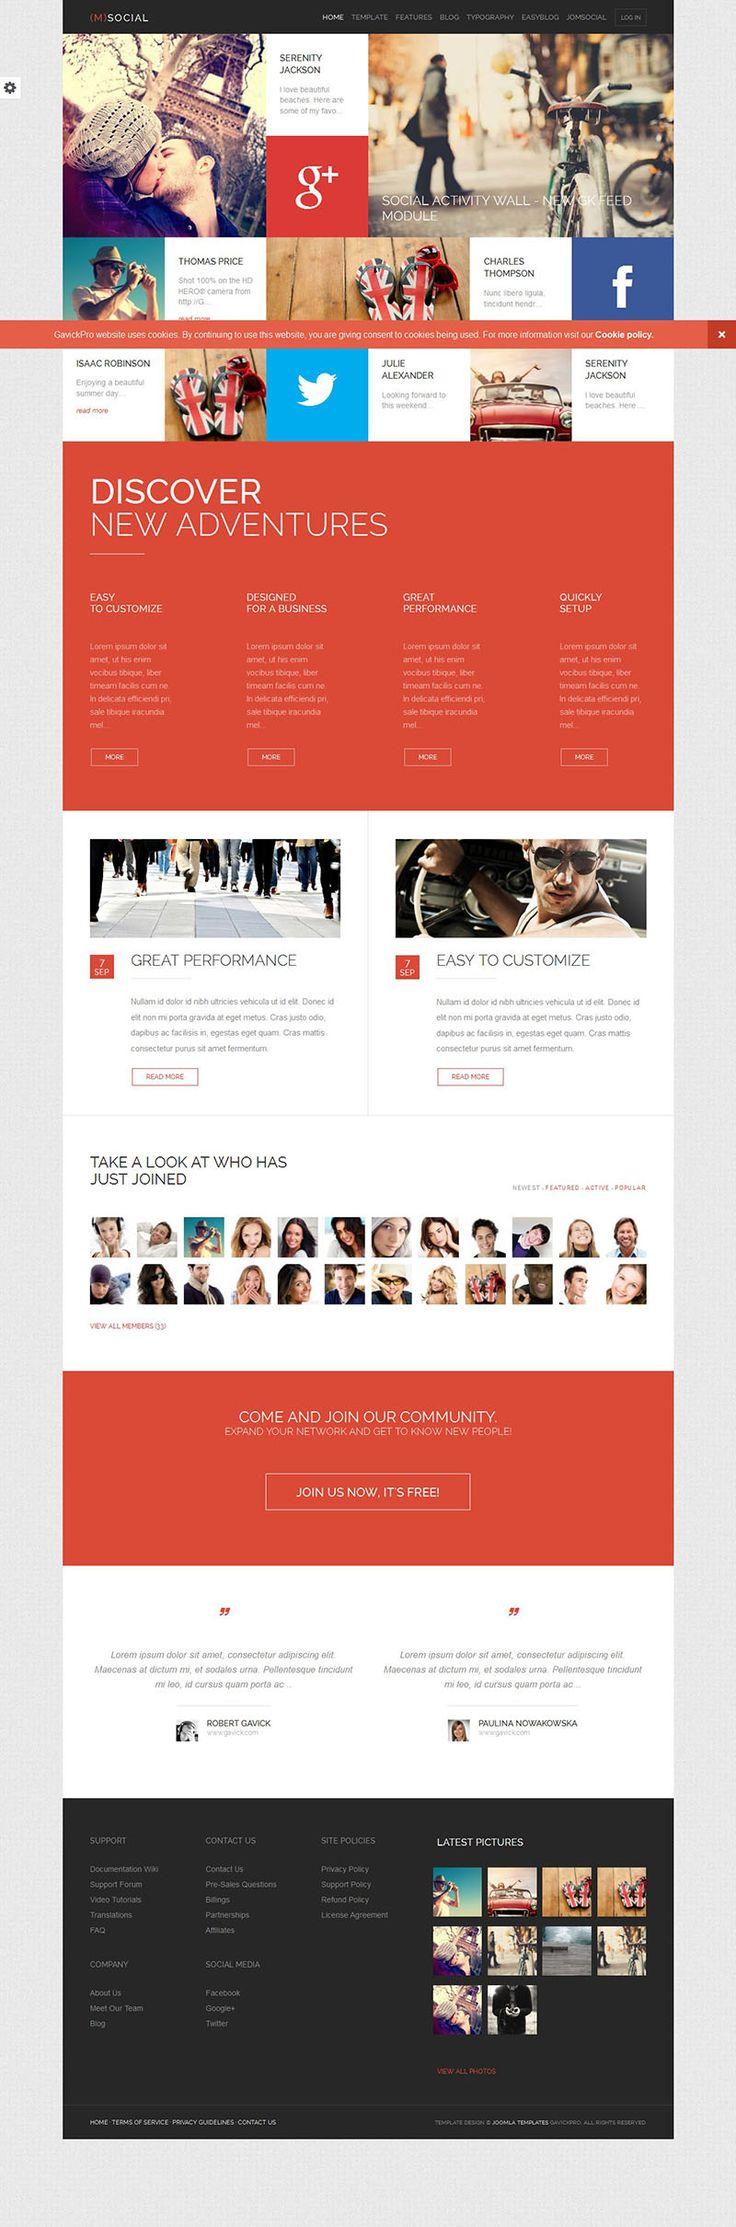 M-Social - Responsive #Joomla Theme for #JomSocial http://www.themesandmods.com/joomla-templates/m-social/